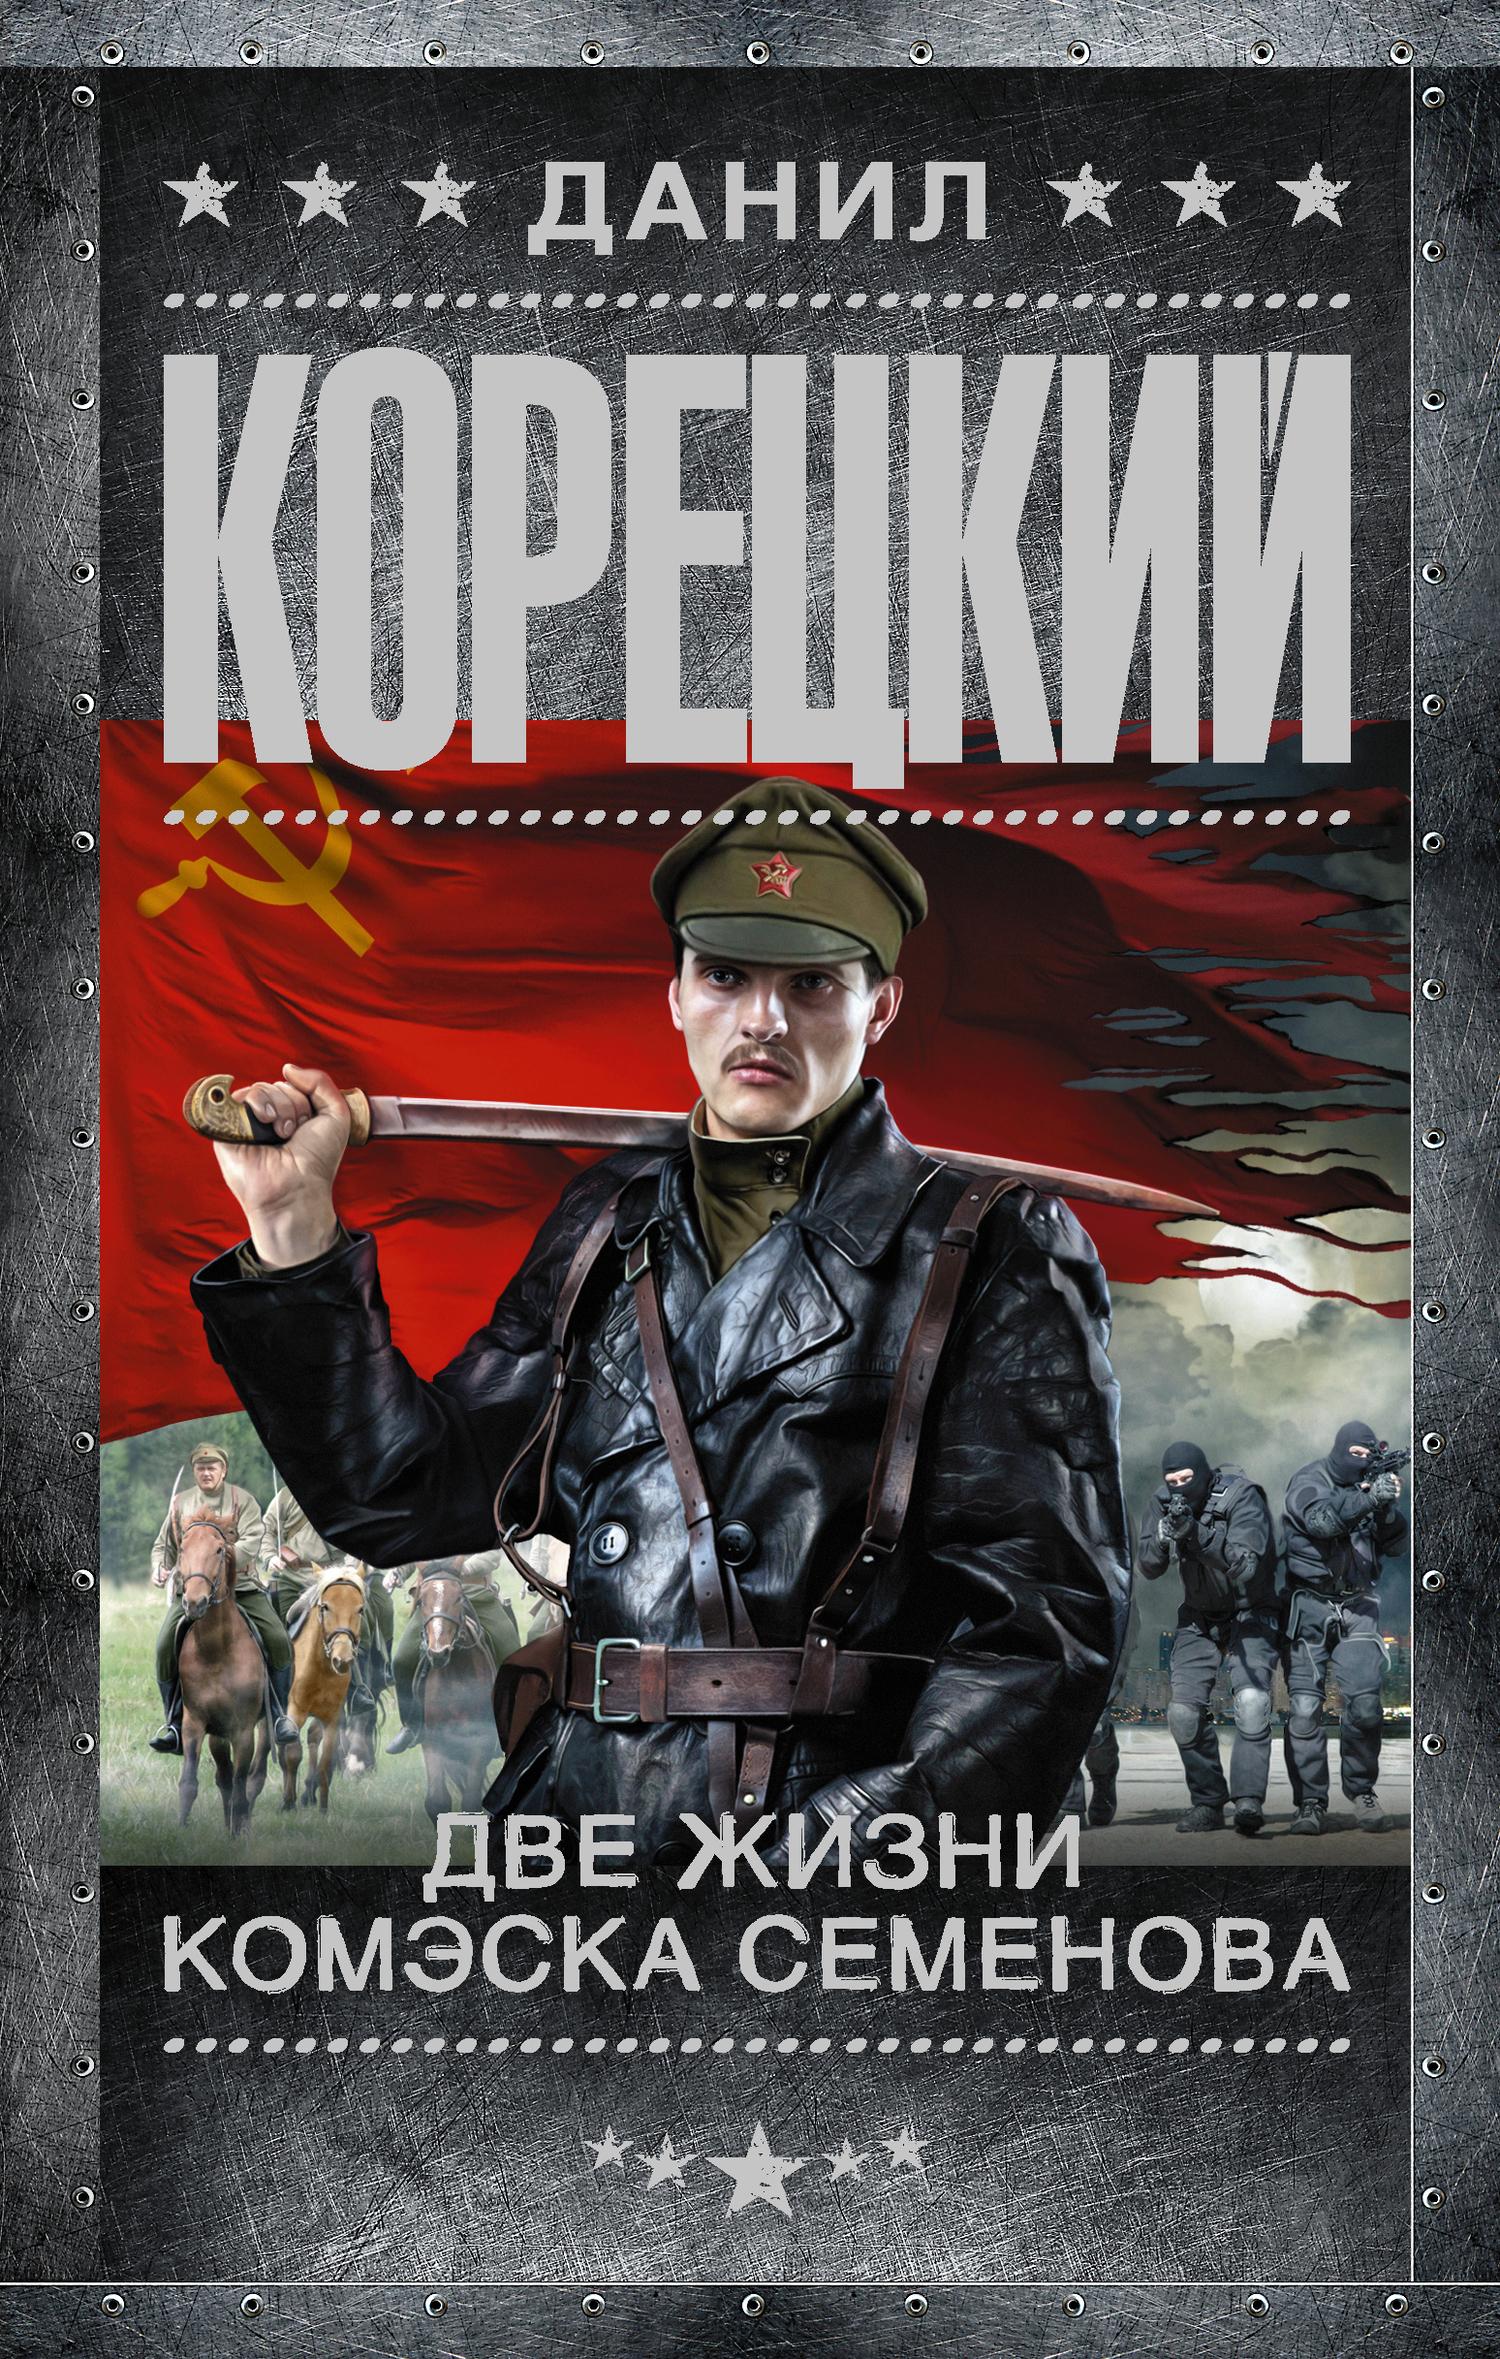 Данил Корецкий бесплатно